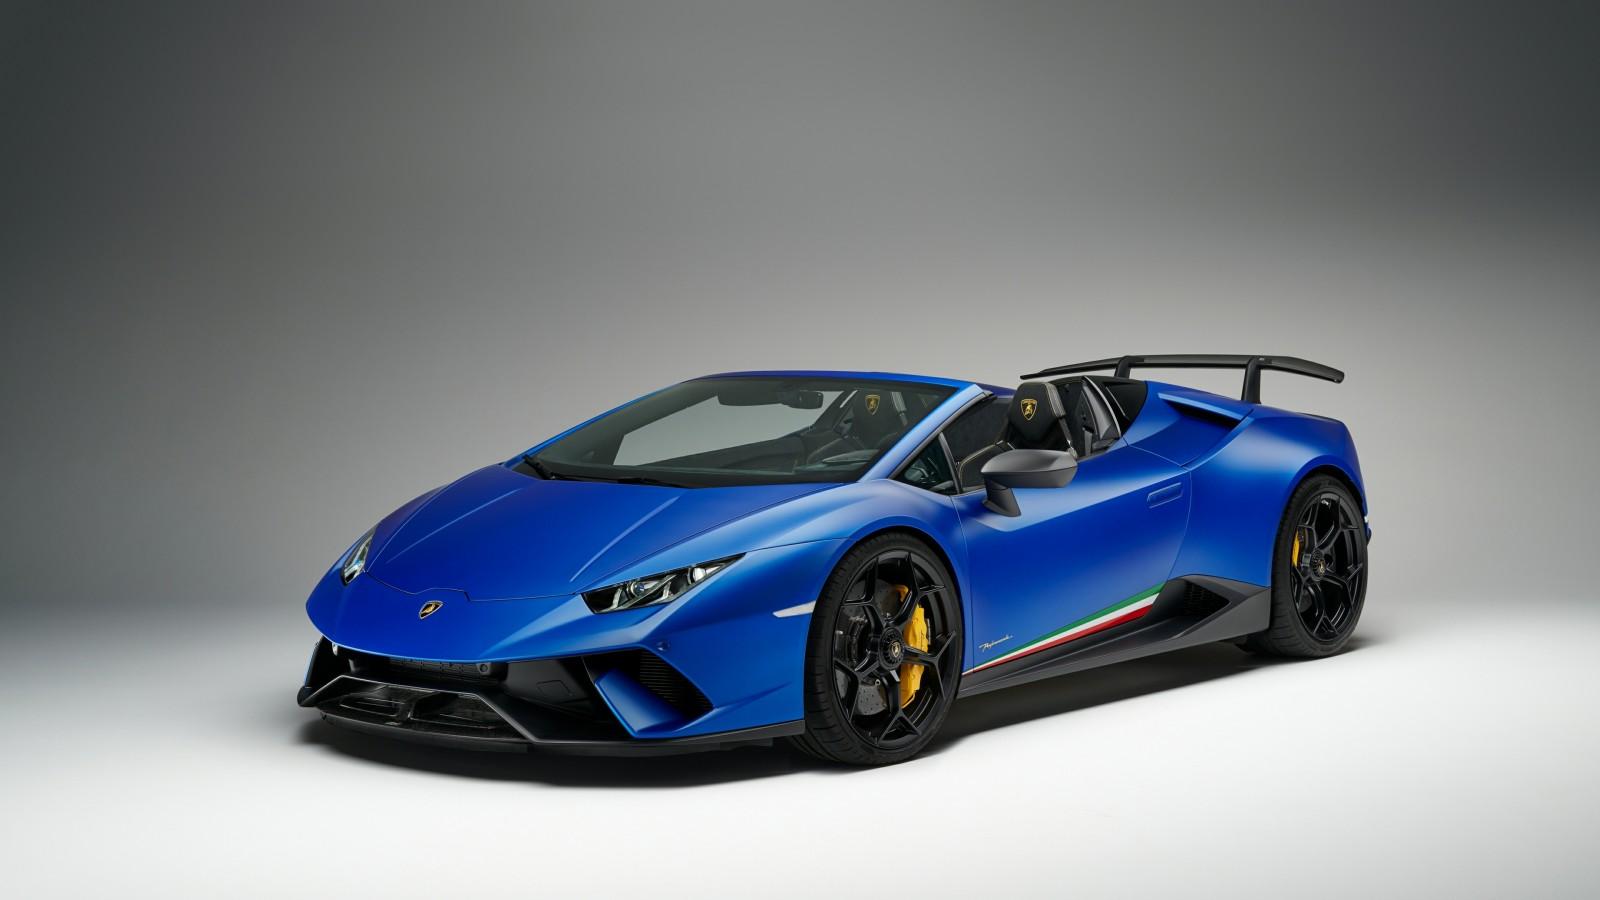 2018 Lamborghini Huracan Perfomante Spyder 4k 4 Wallpaper Hd Car Wallpapers Id 9802